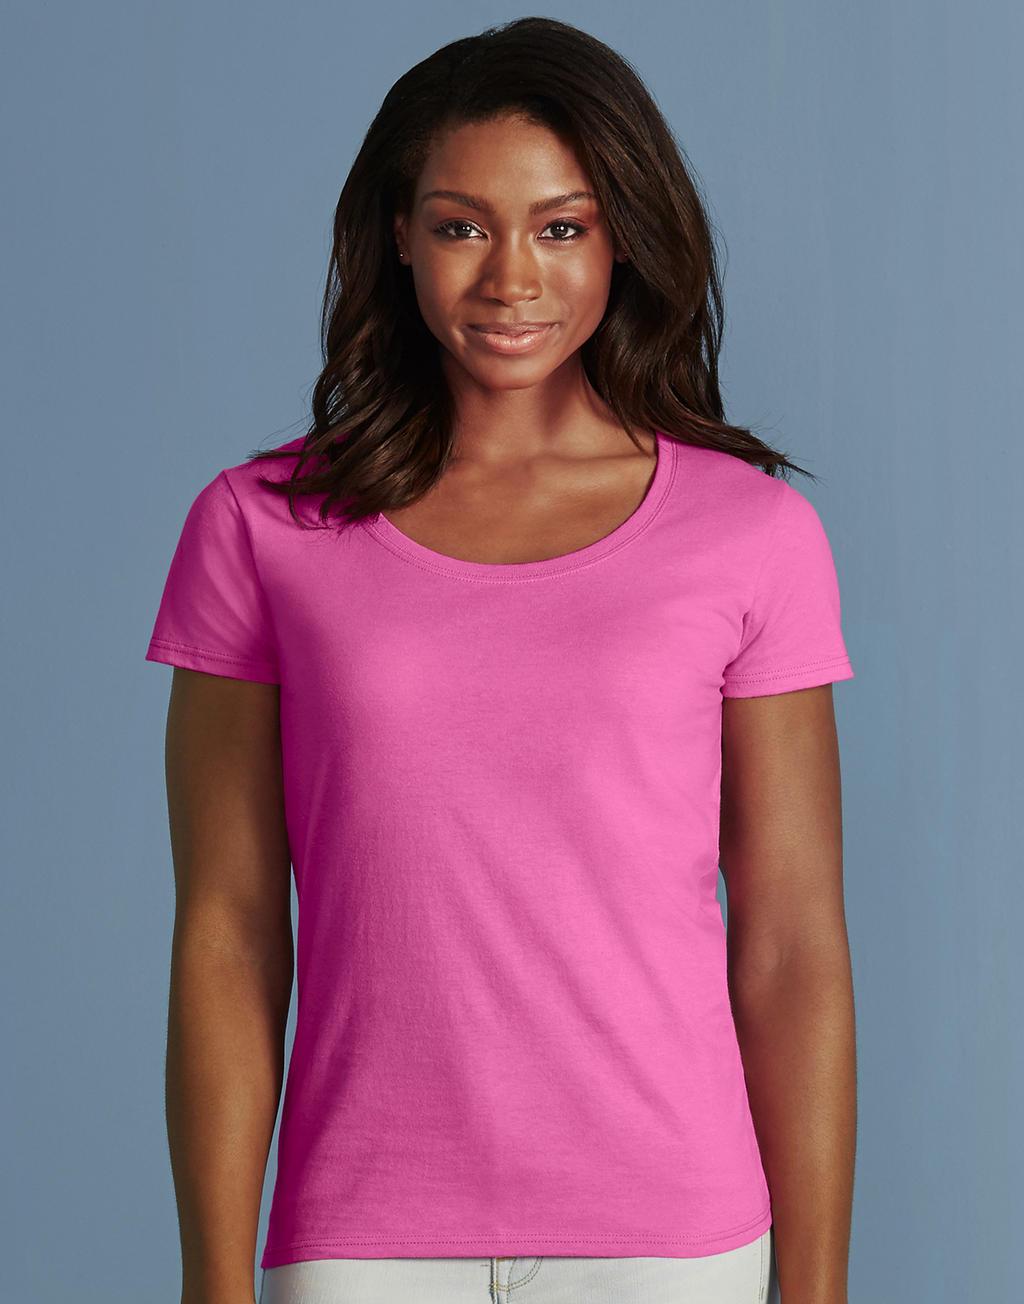 64550L SOFTSTYLE® LADIES tričko s výstrihom